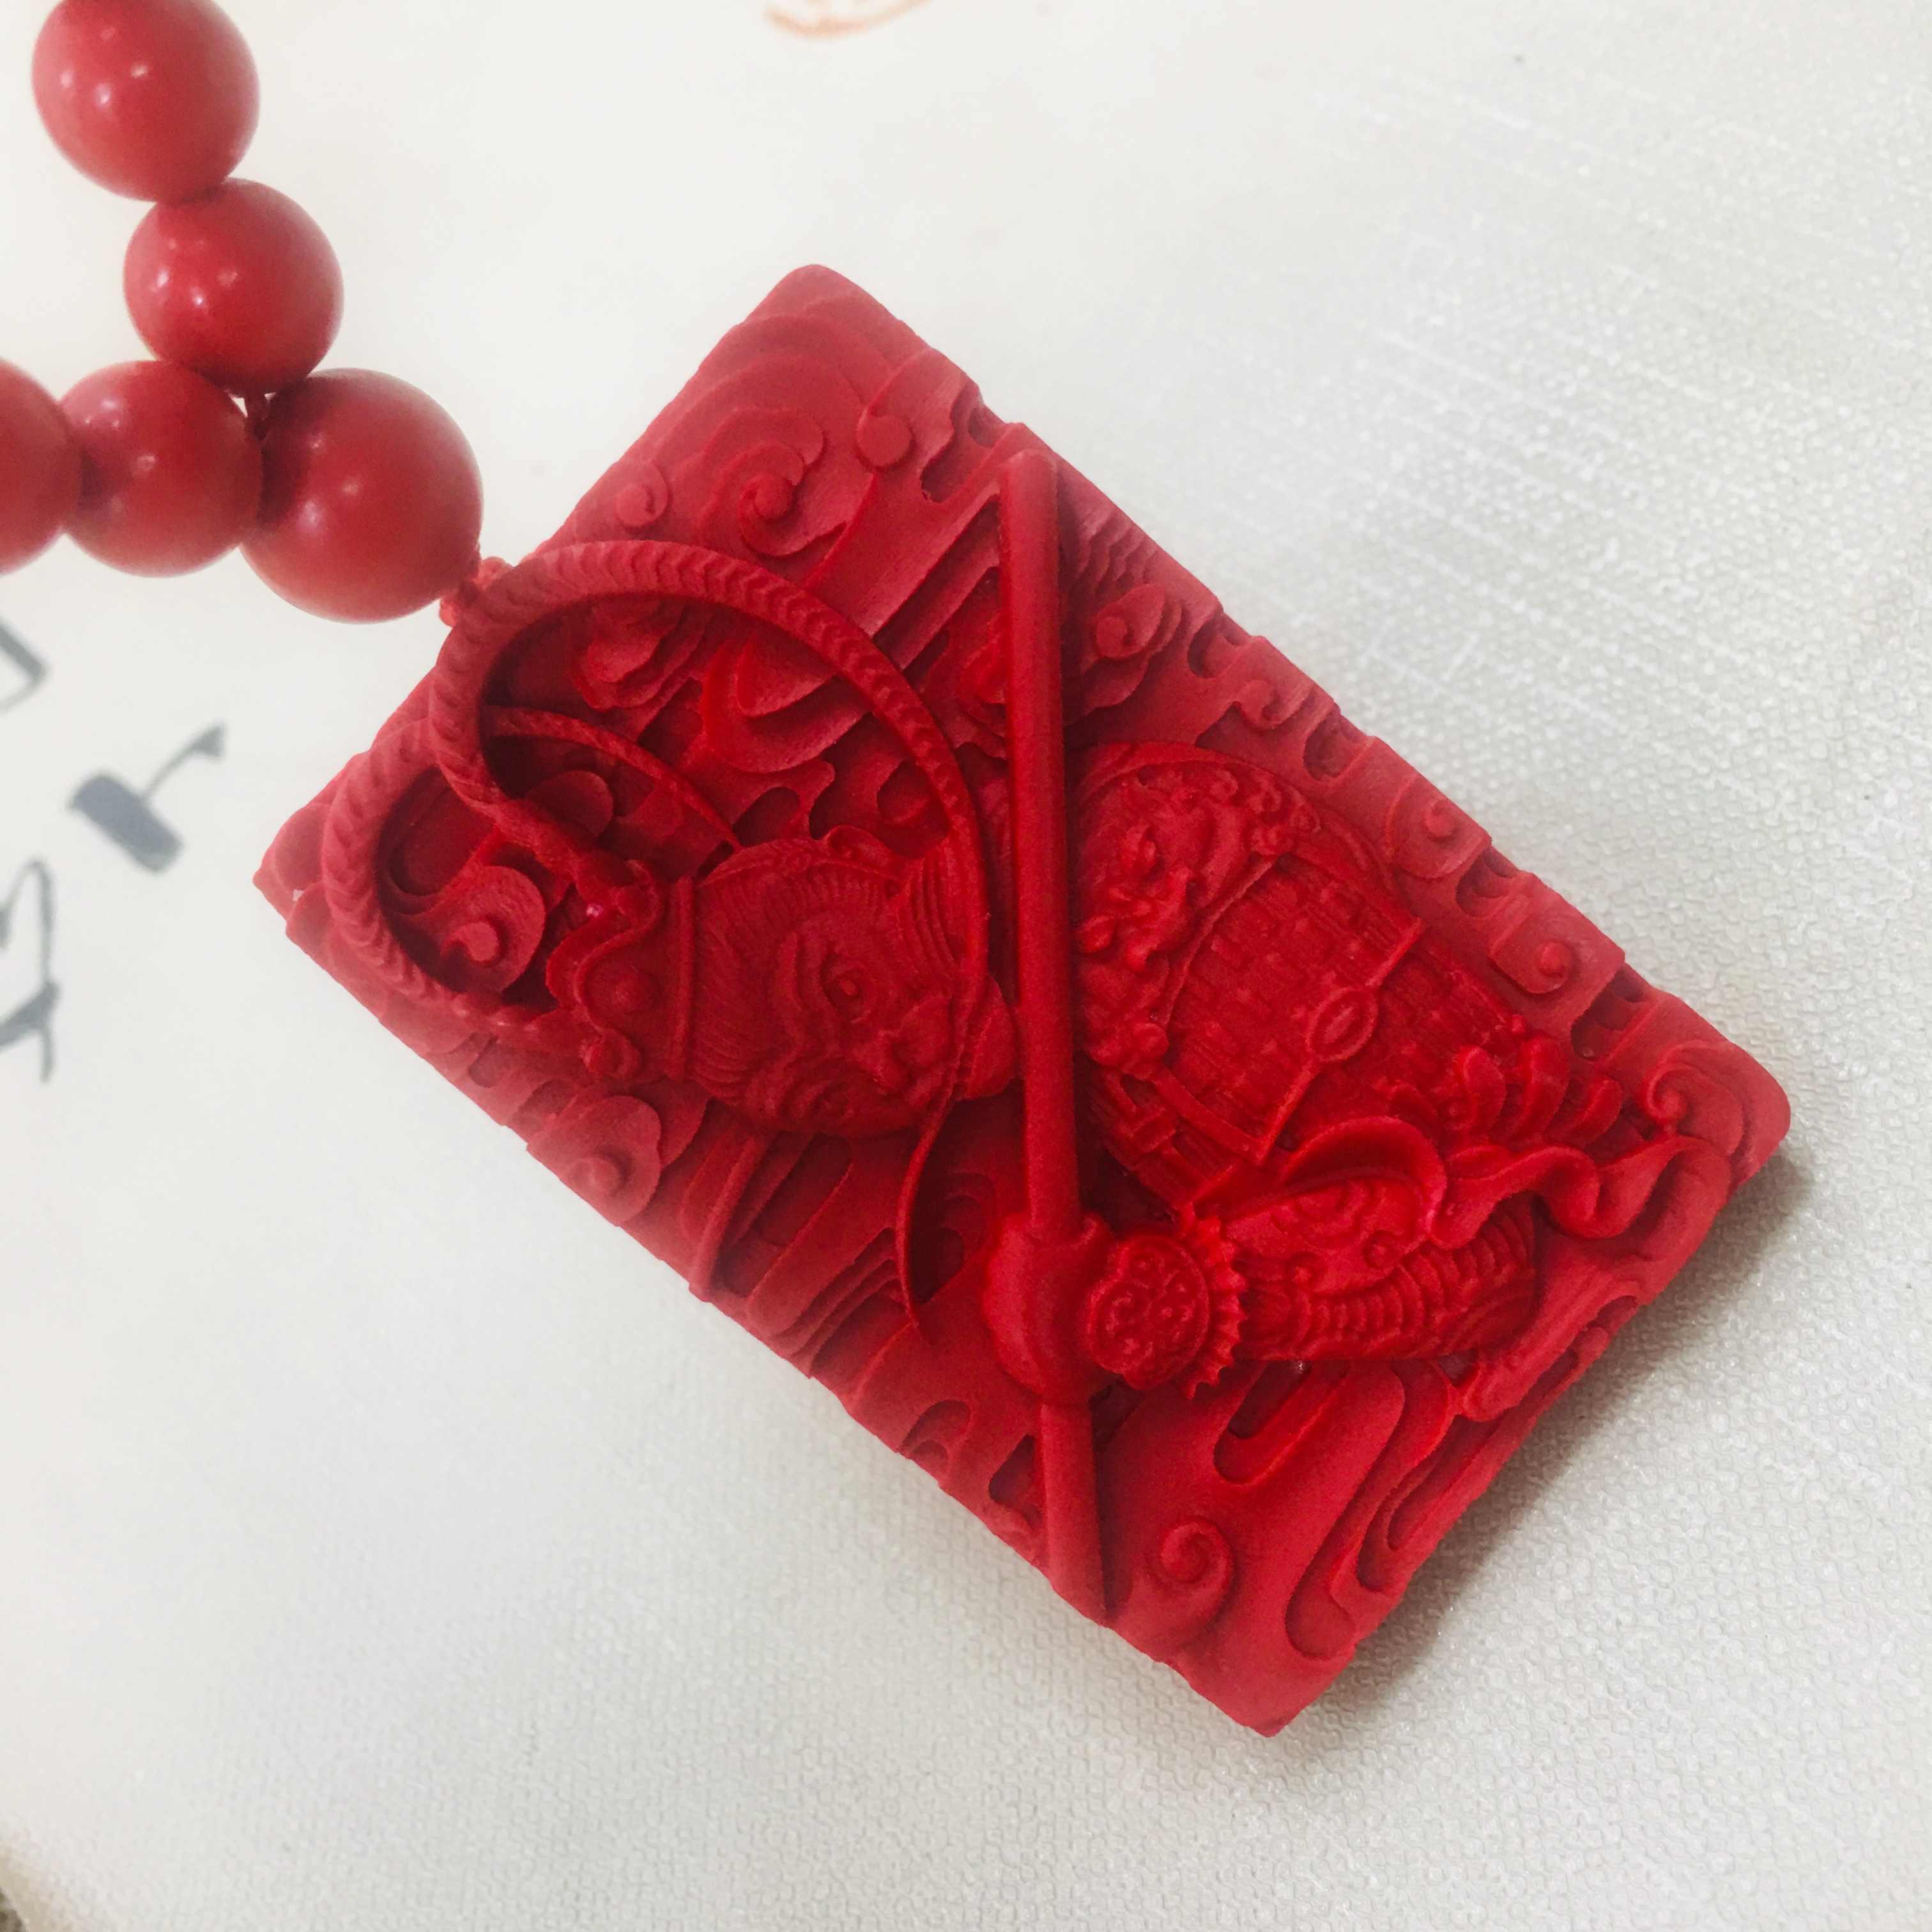 Zheru 天然朱色朱色と彫刻レッド両面孫悟空ペンダントビーズのネックレスの男性と女性のセーターチェーン